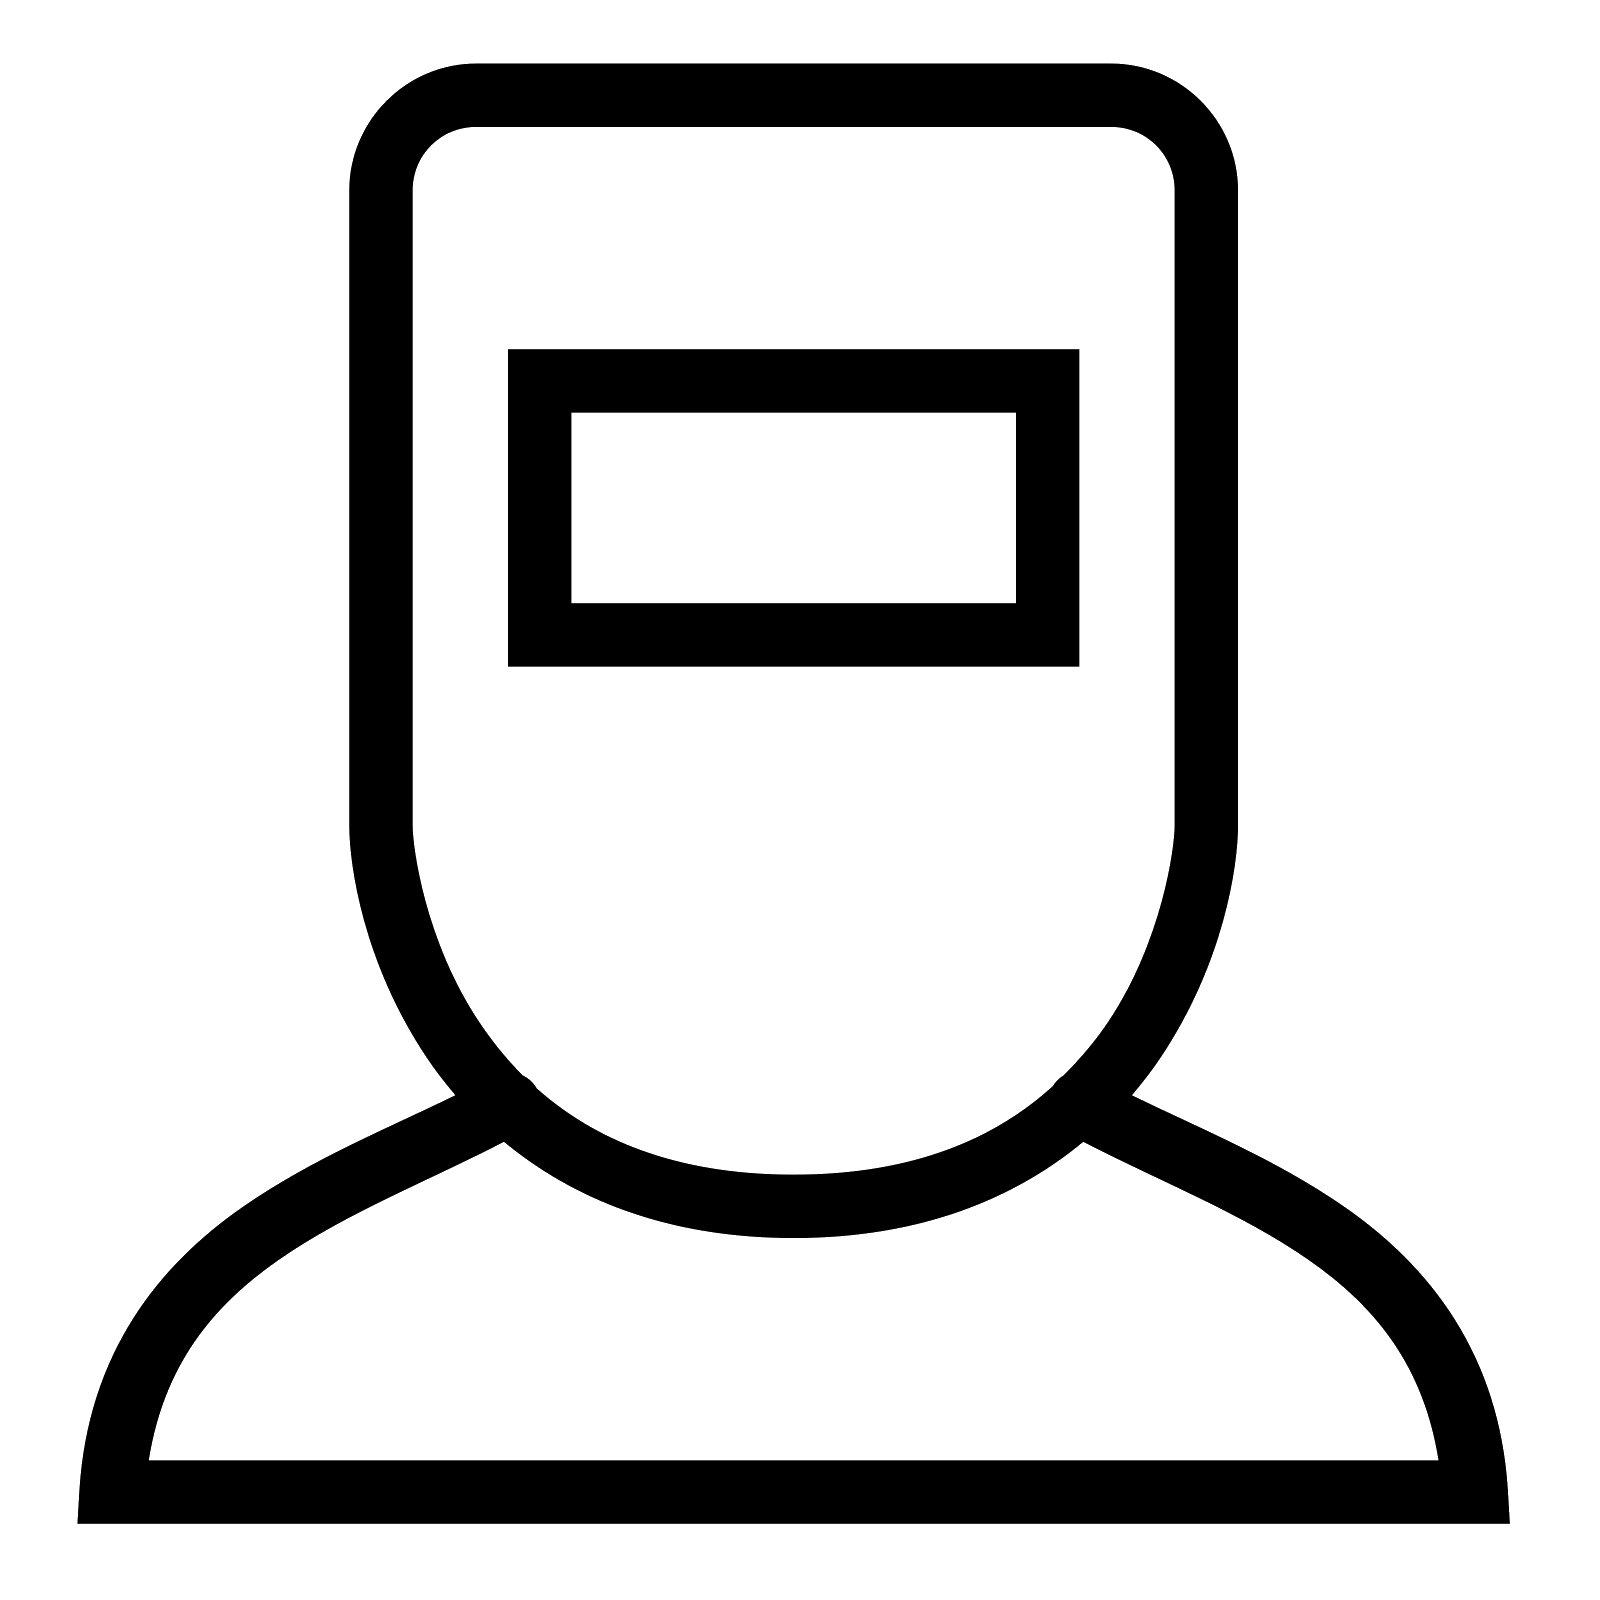 Welding clipart transparent. Welder icon free download